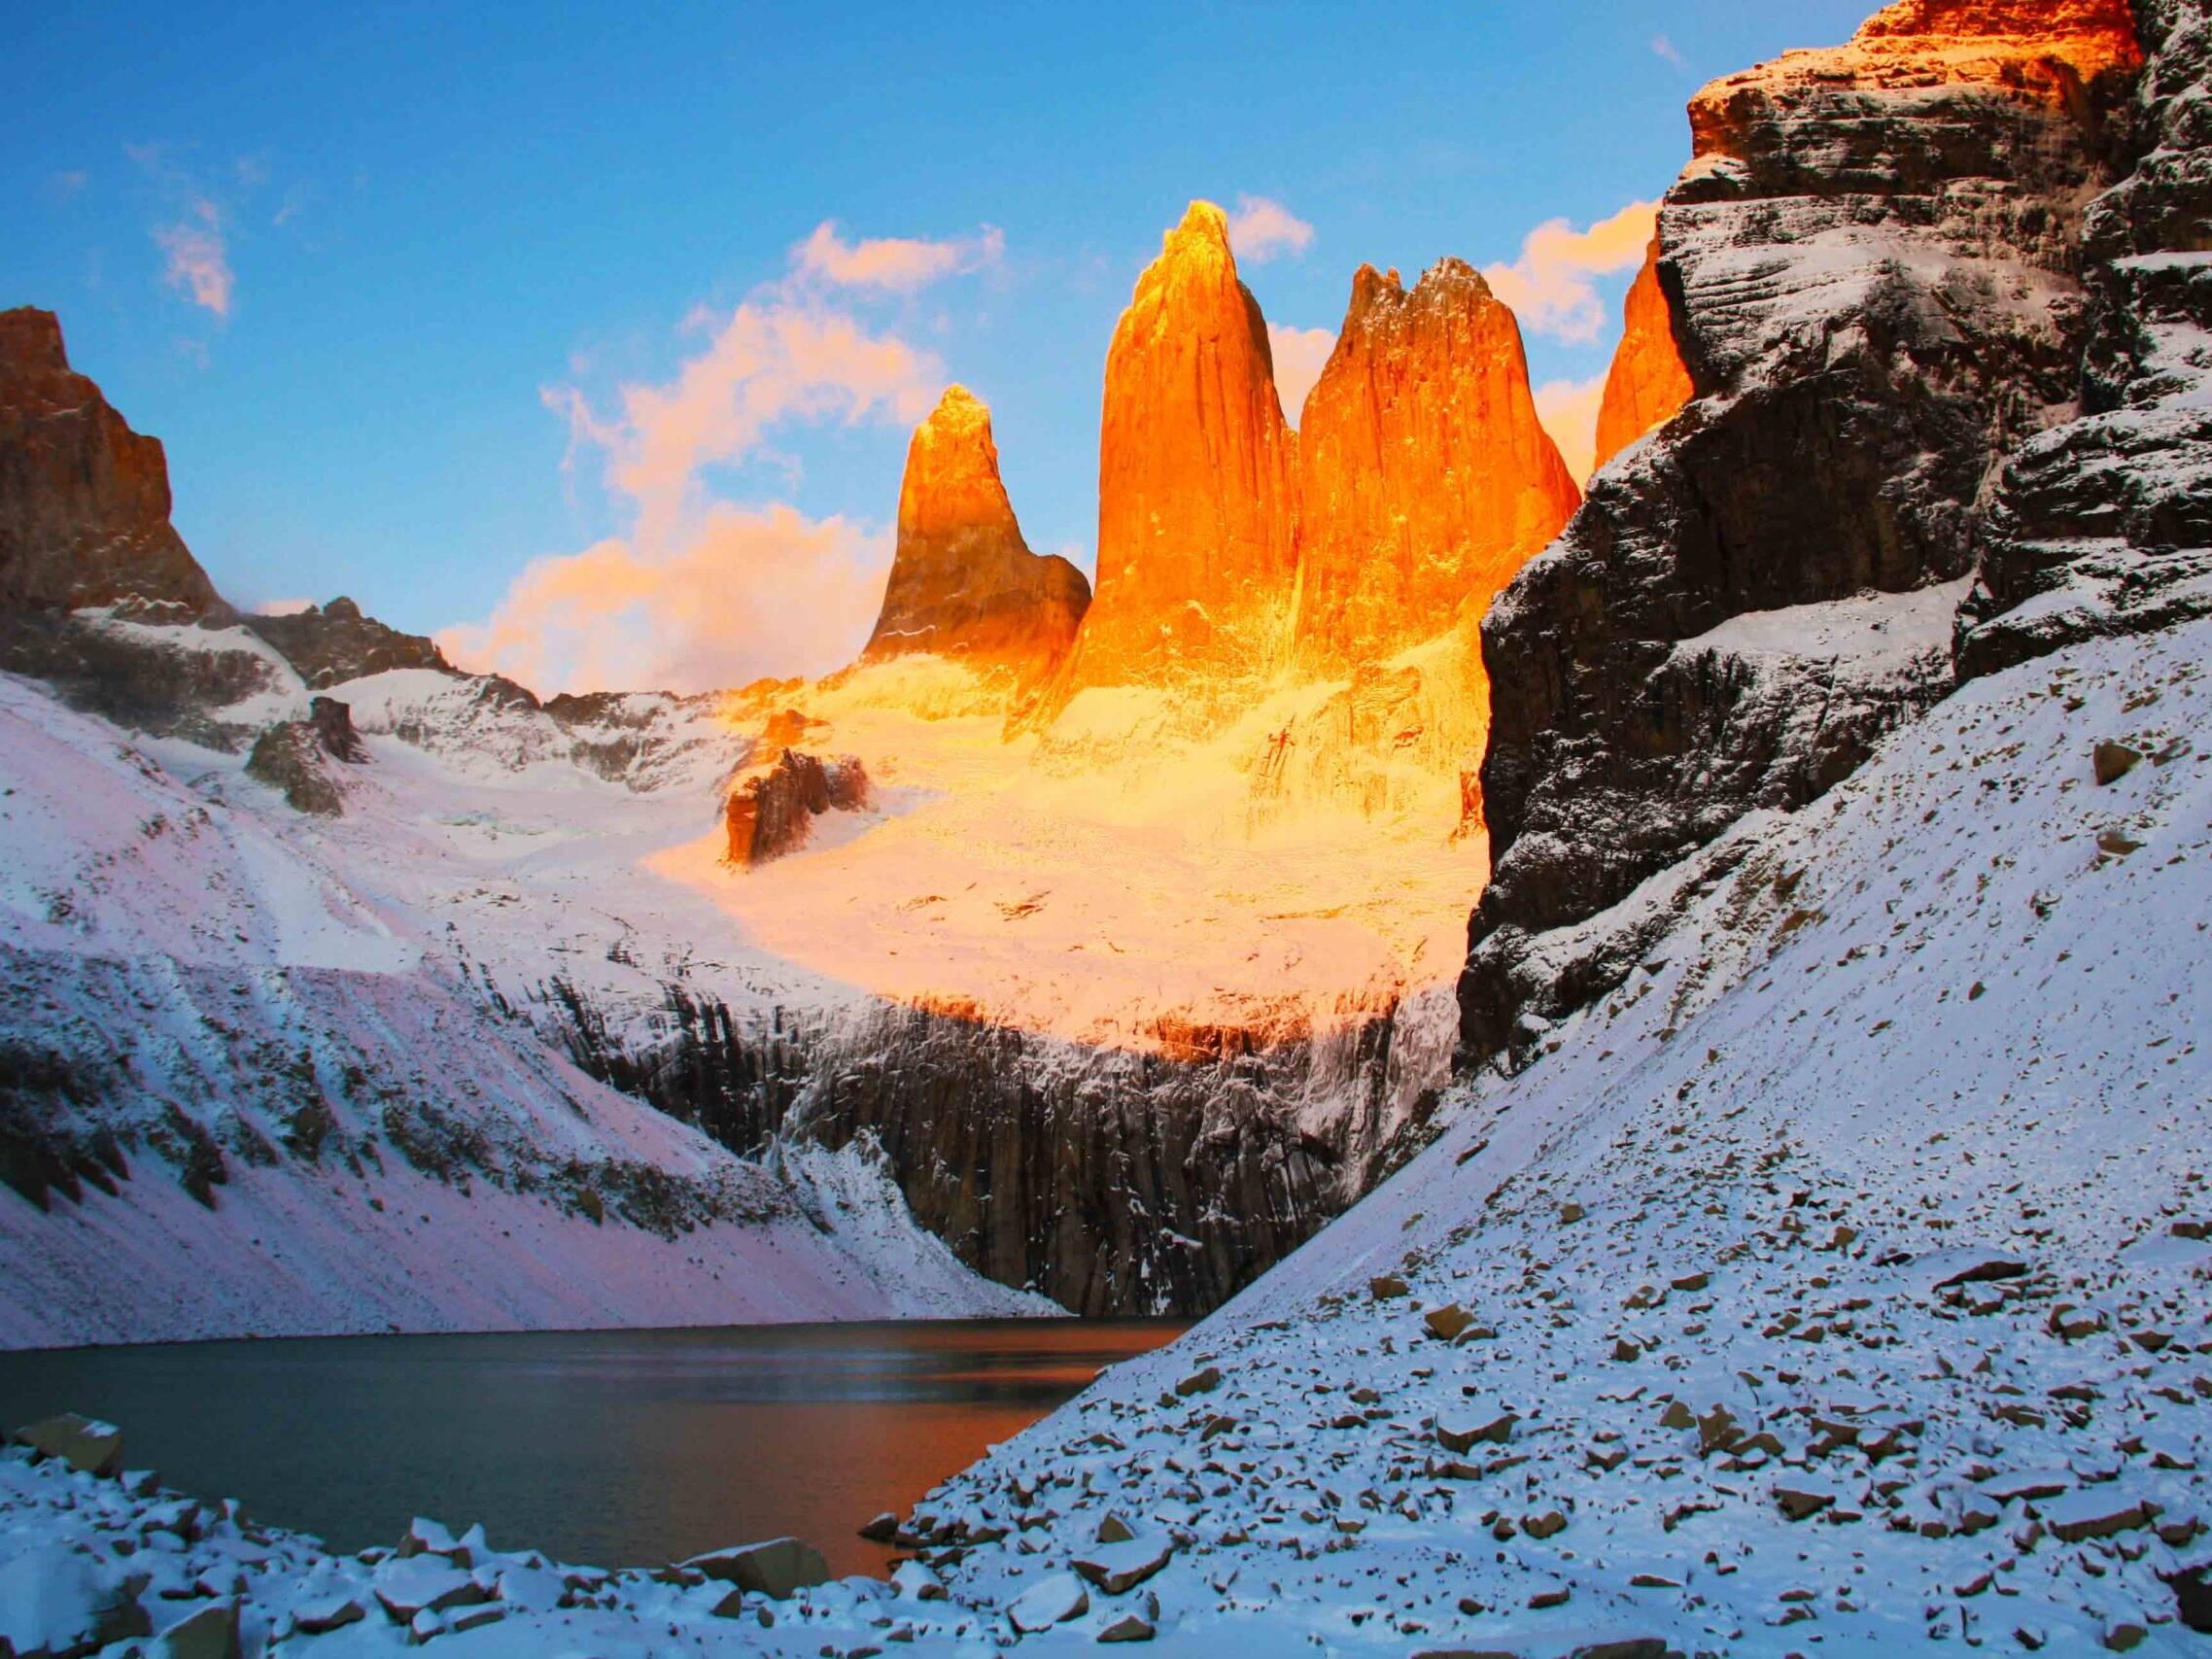 sunrise mountains torres del paine